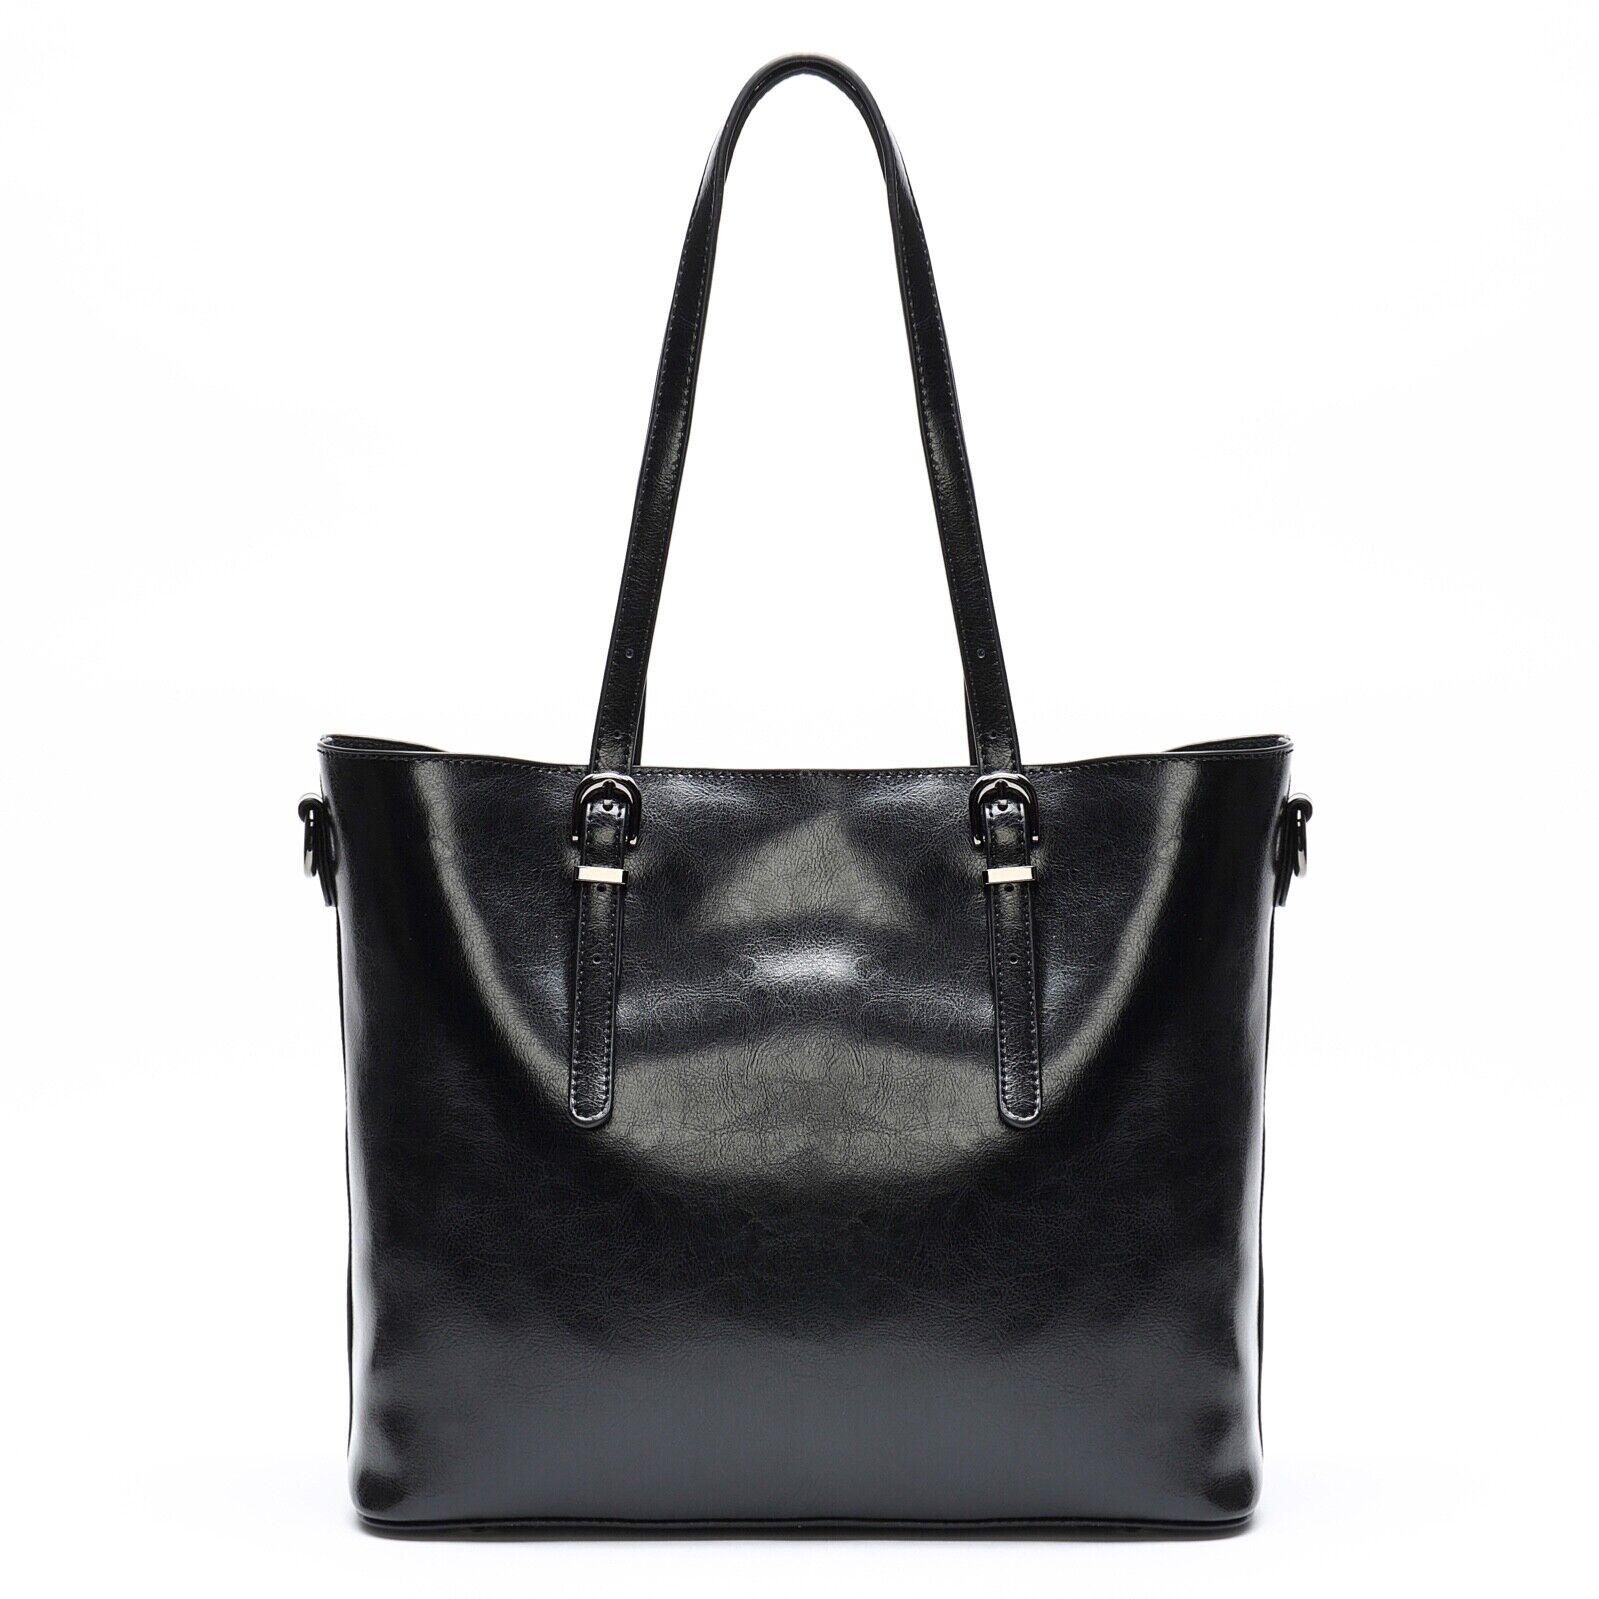 Women's Genuine Leather Shoulder bag Crossbody Tote Handbag